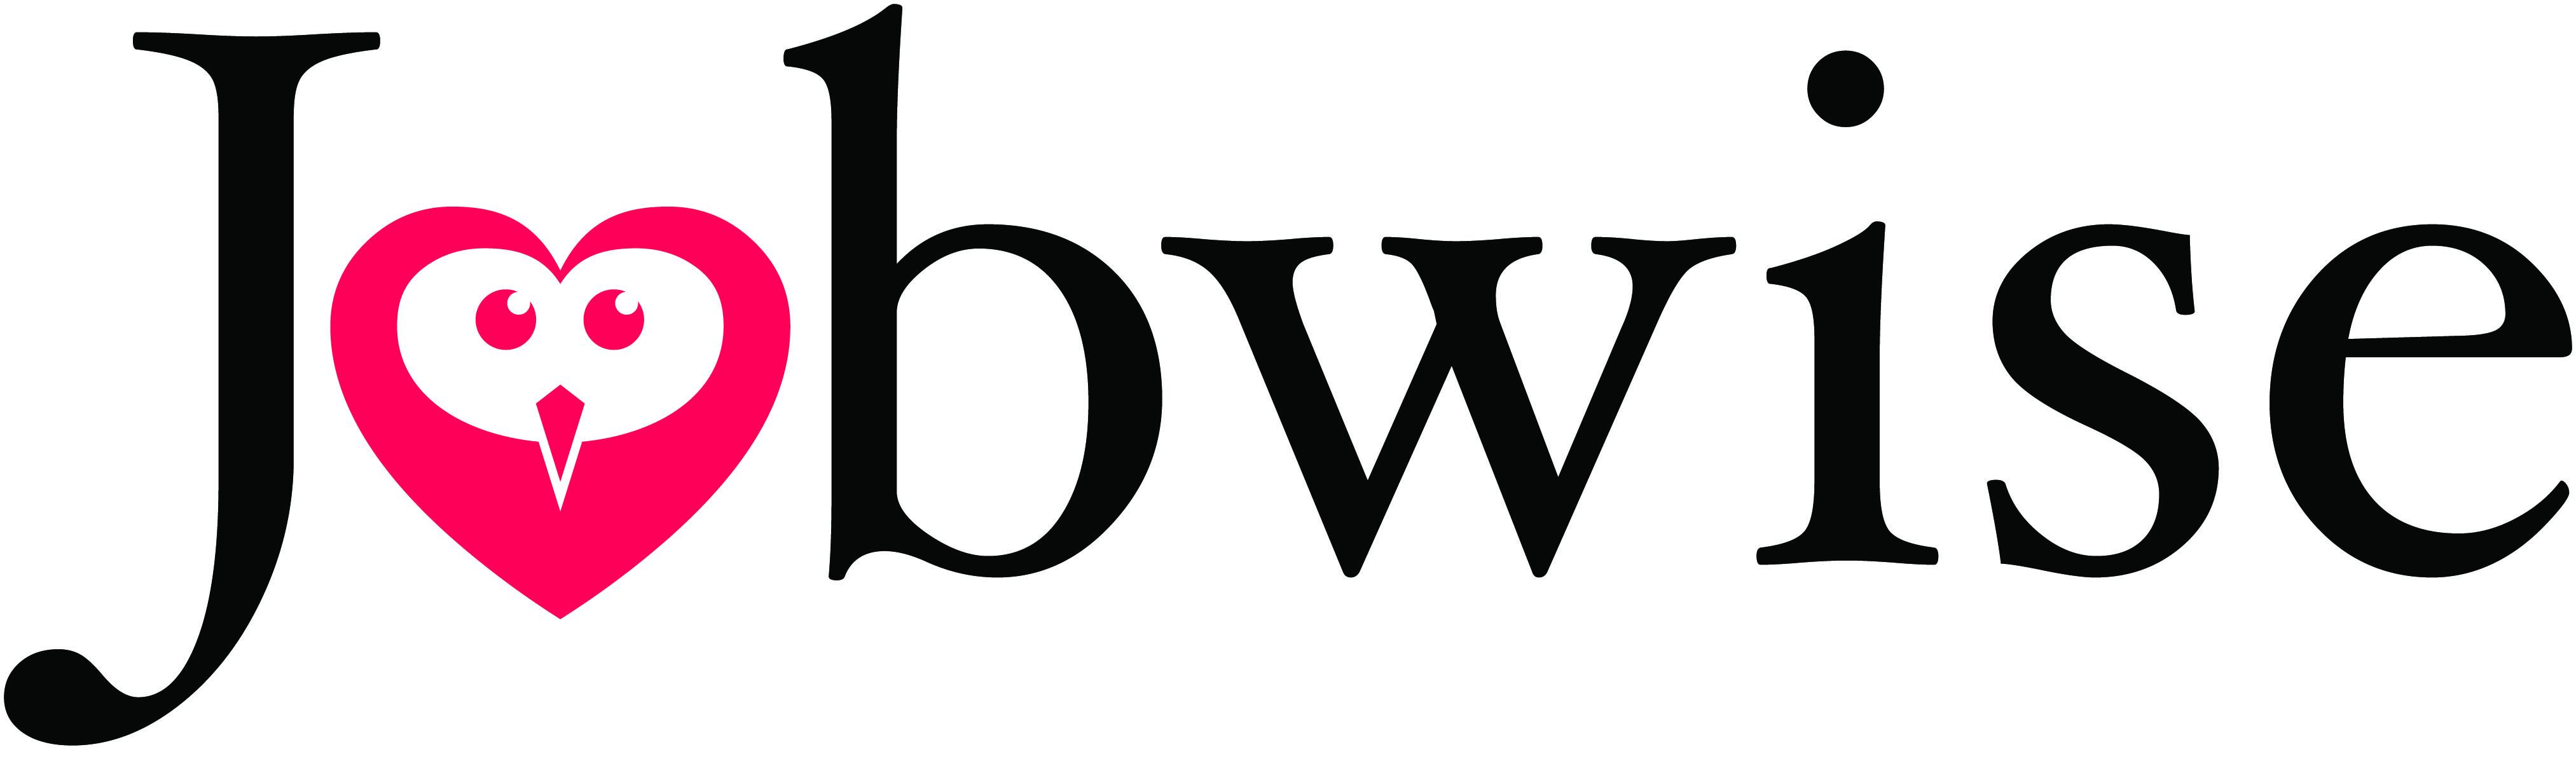 Jobwise logo